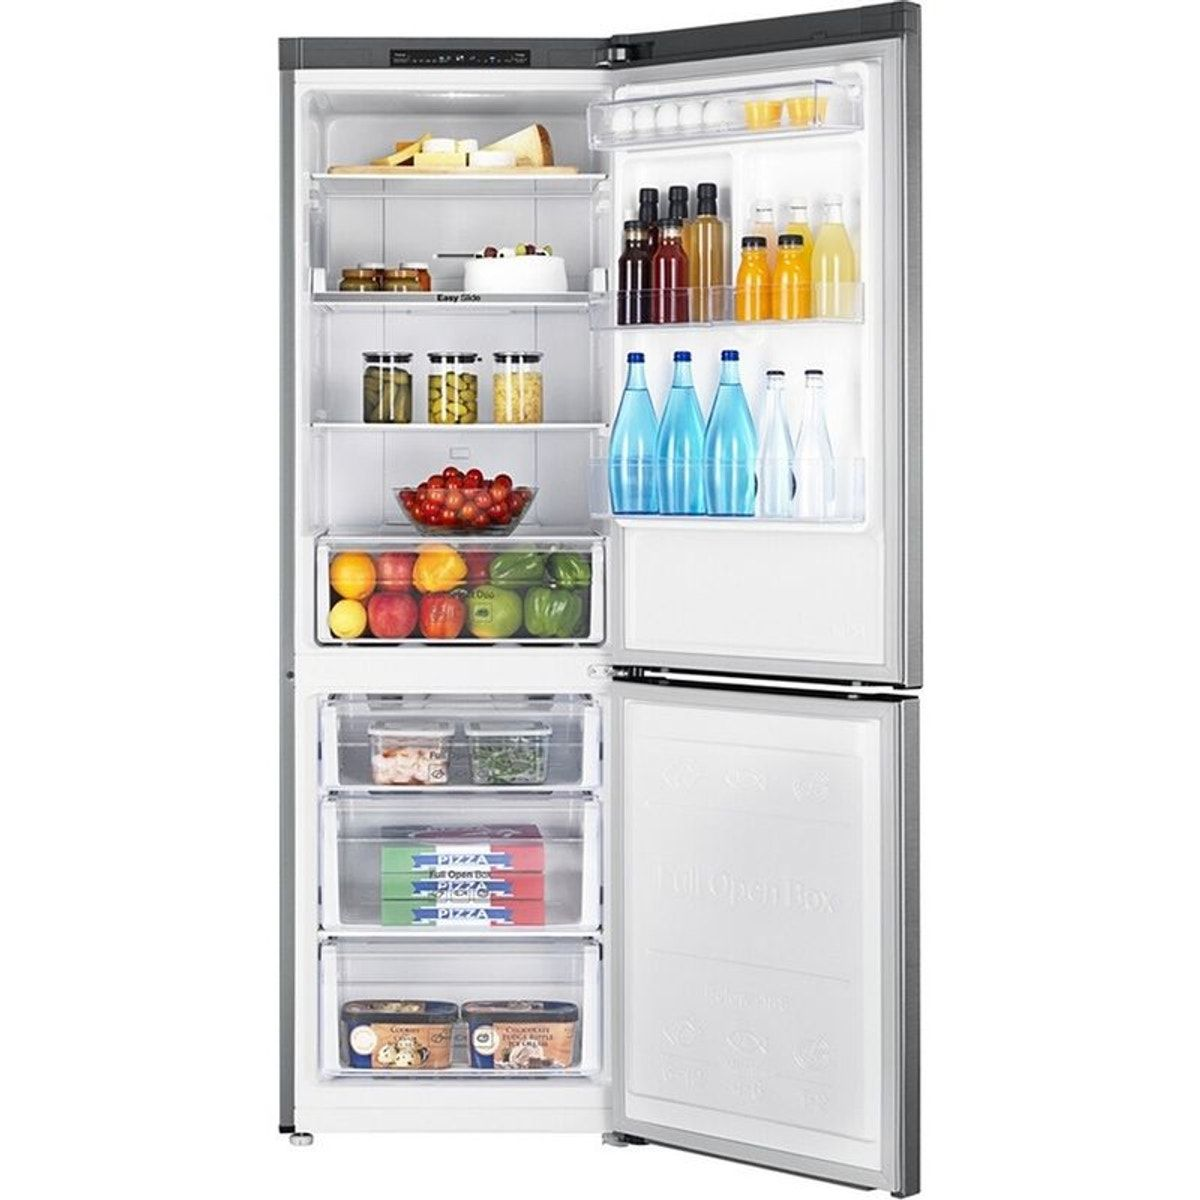 Dimension Frigo Encastrable Ikea refrigerateur congelateur en bas rb33n300nsa/ef - taille